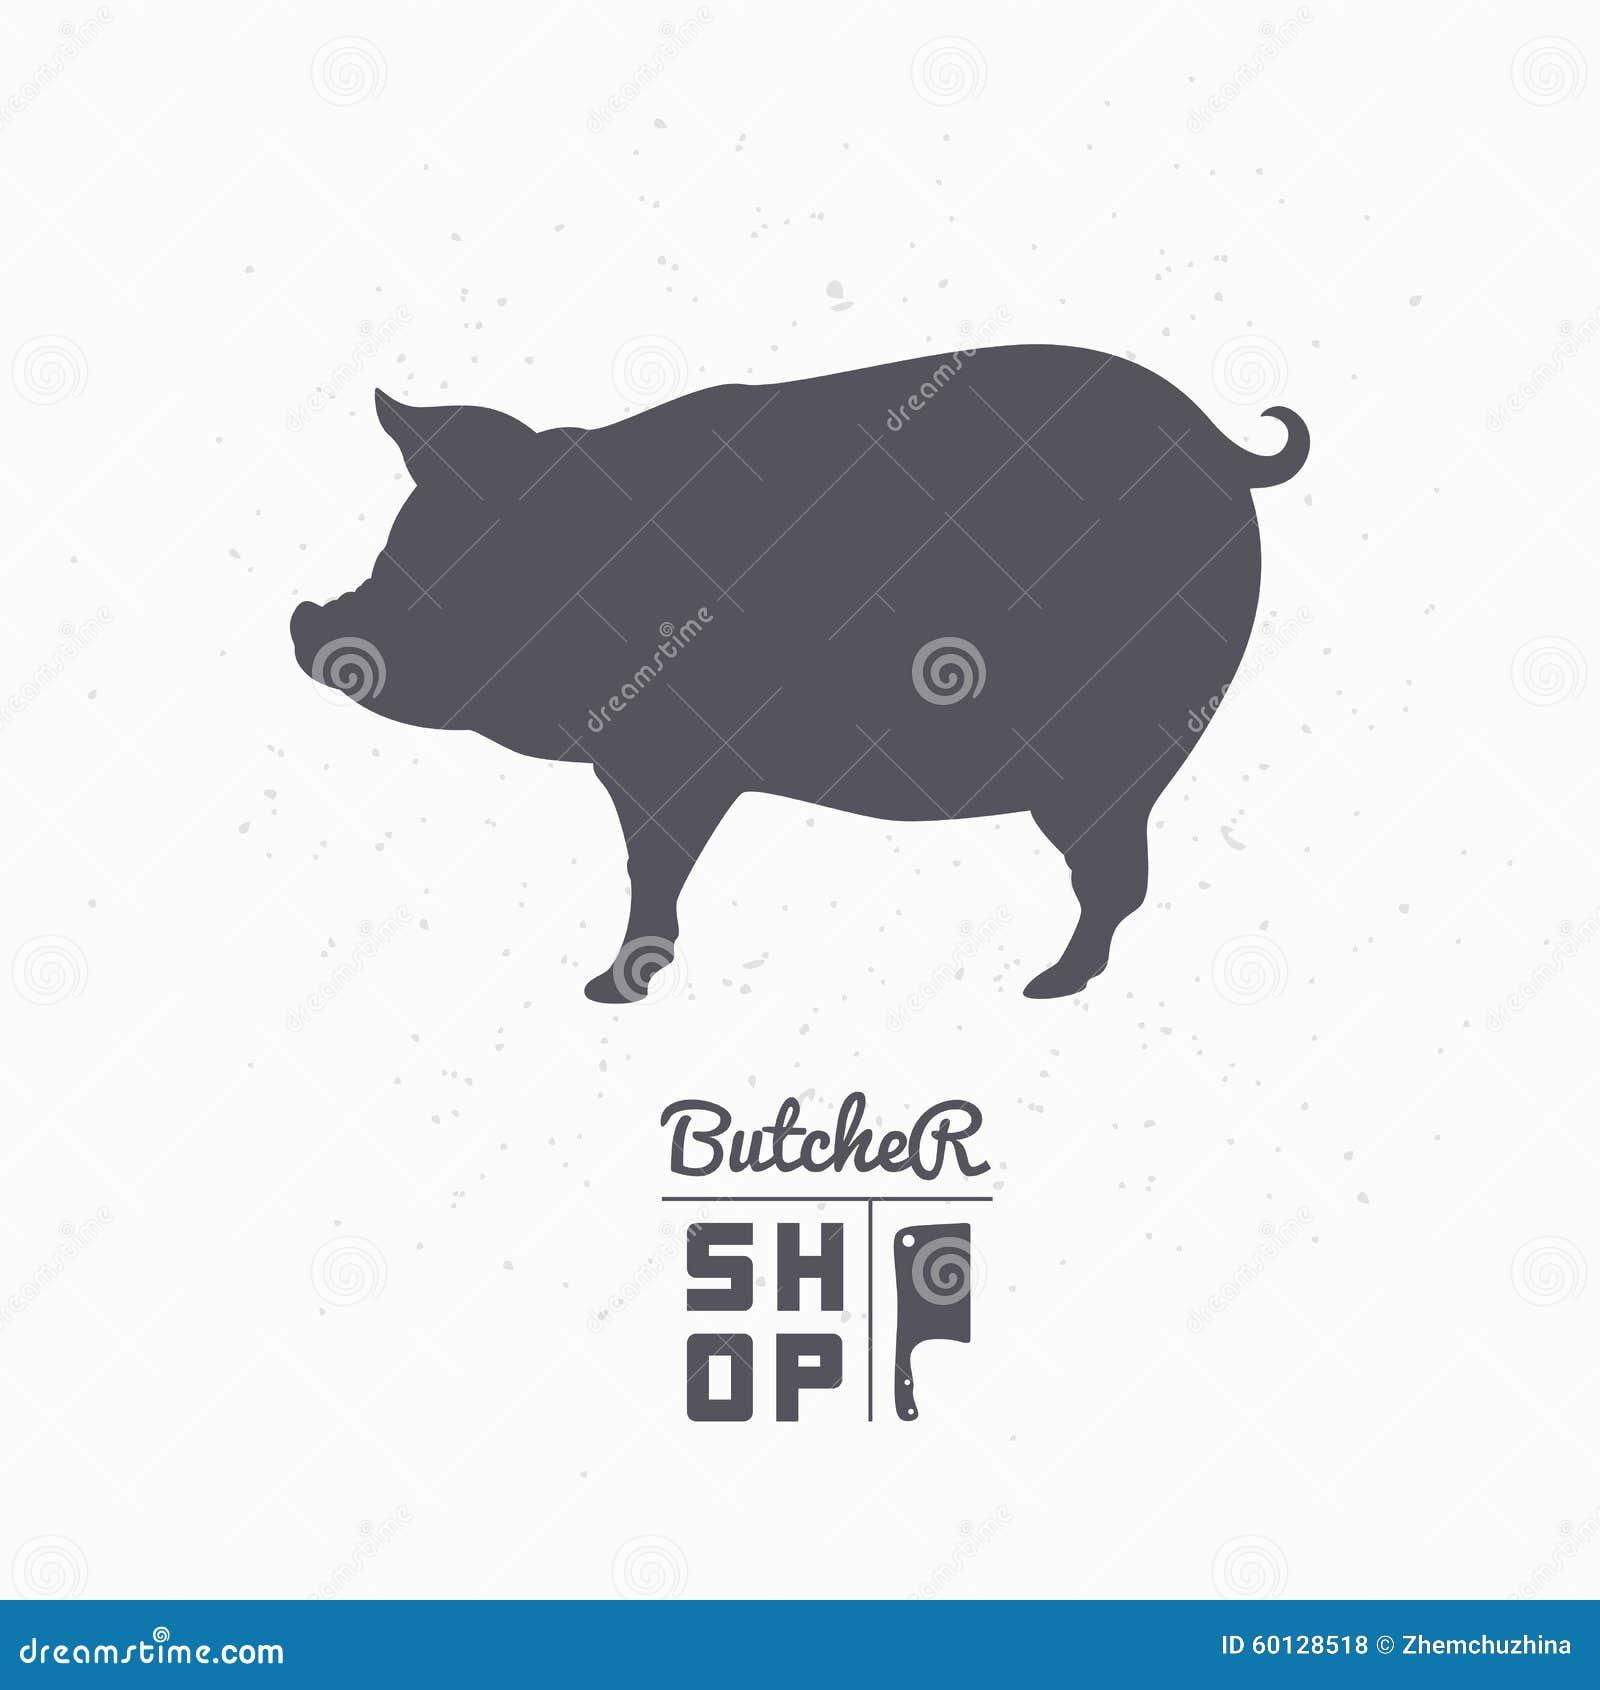 Butchery business plan template